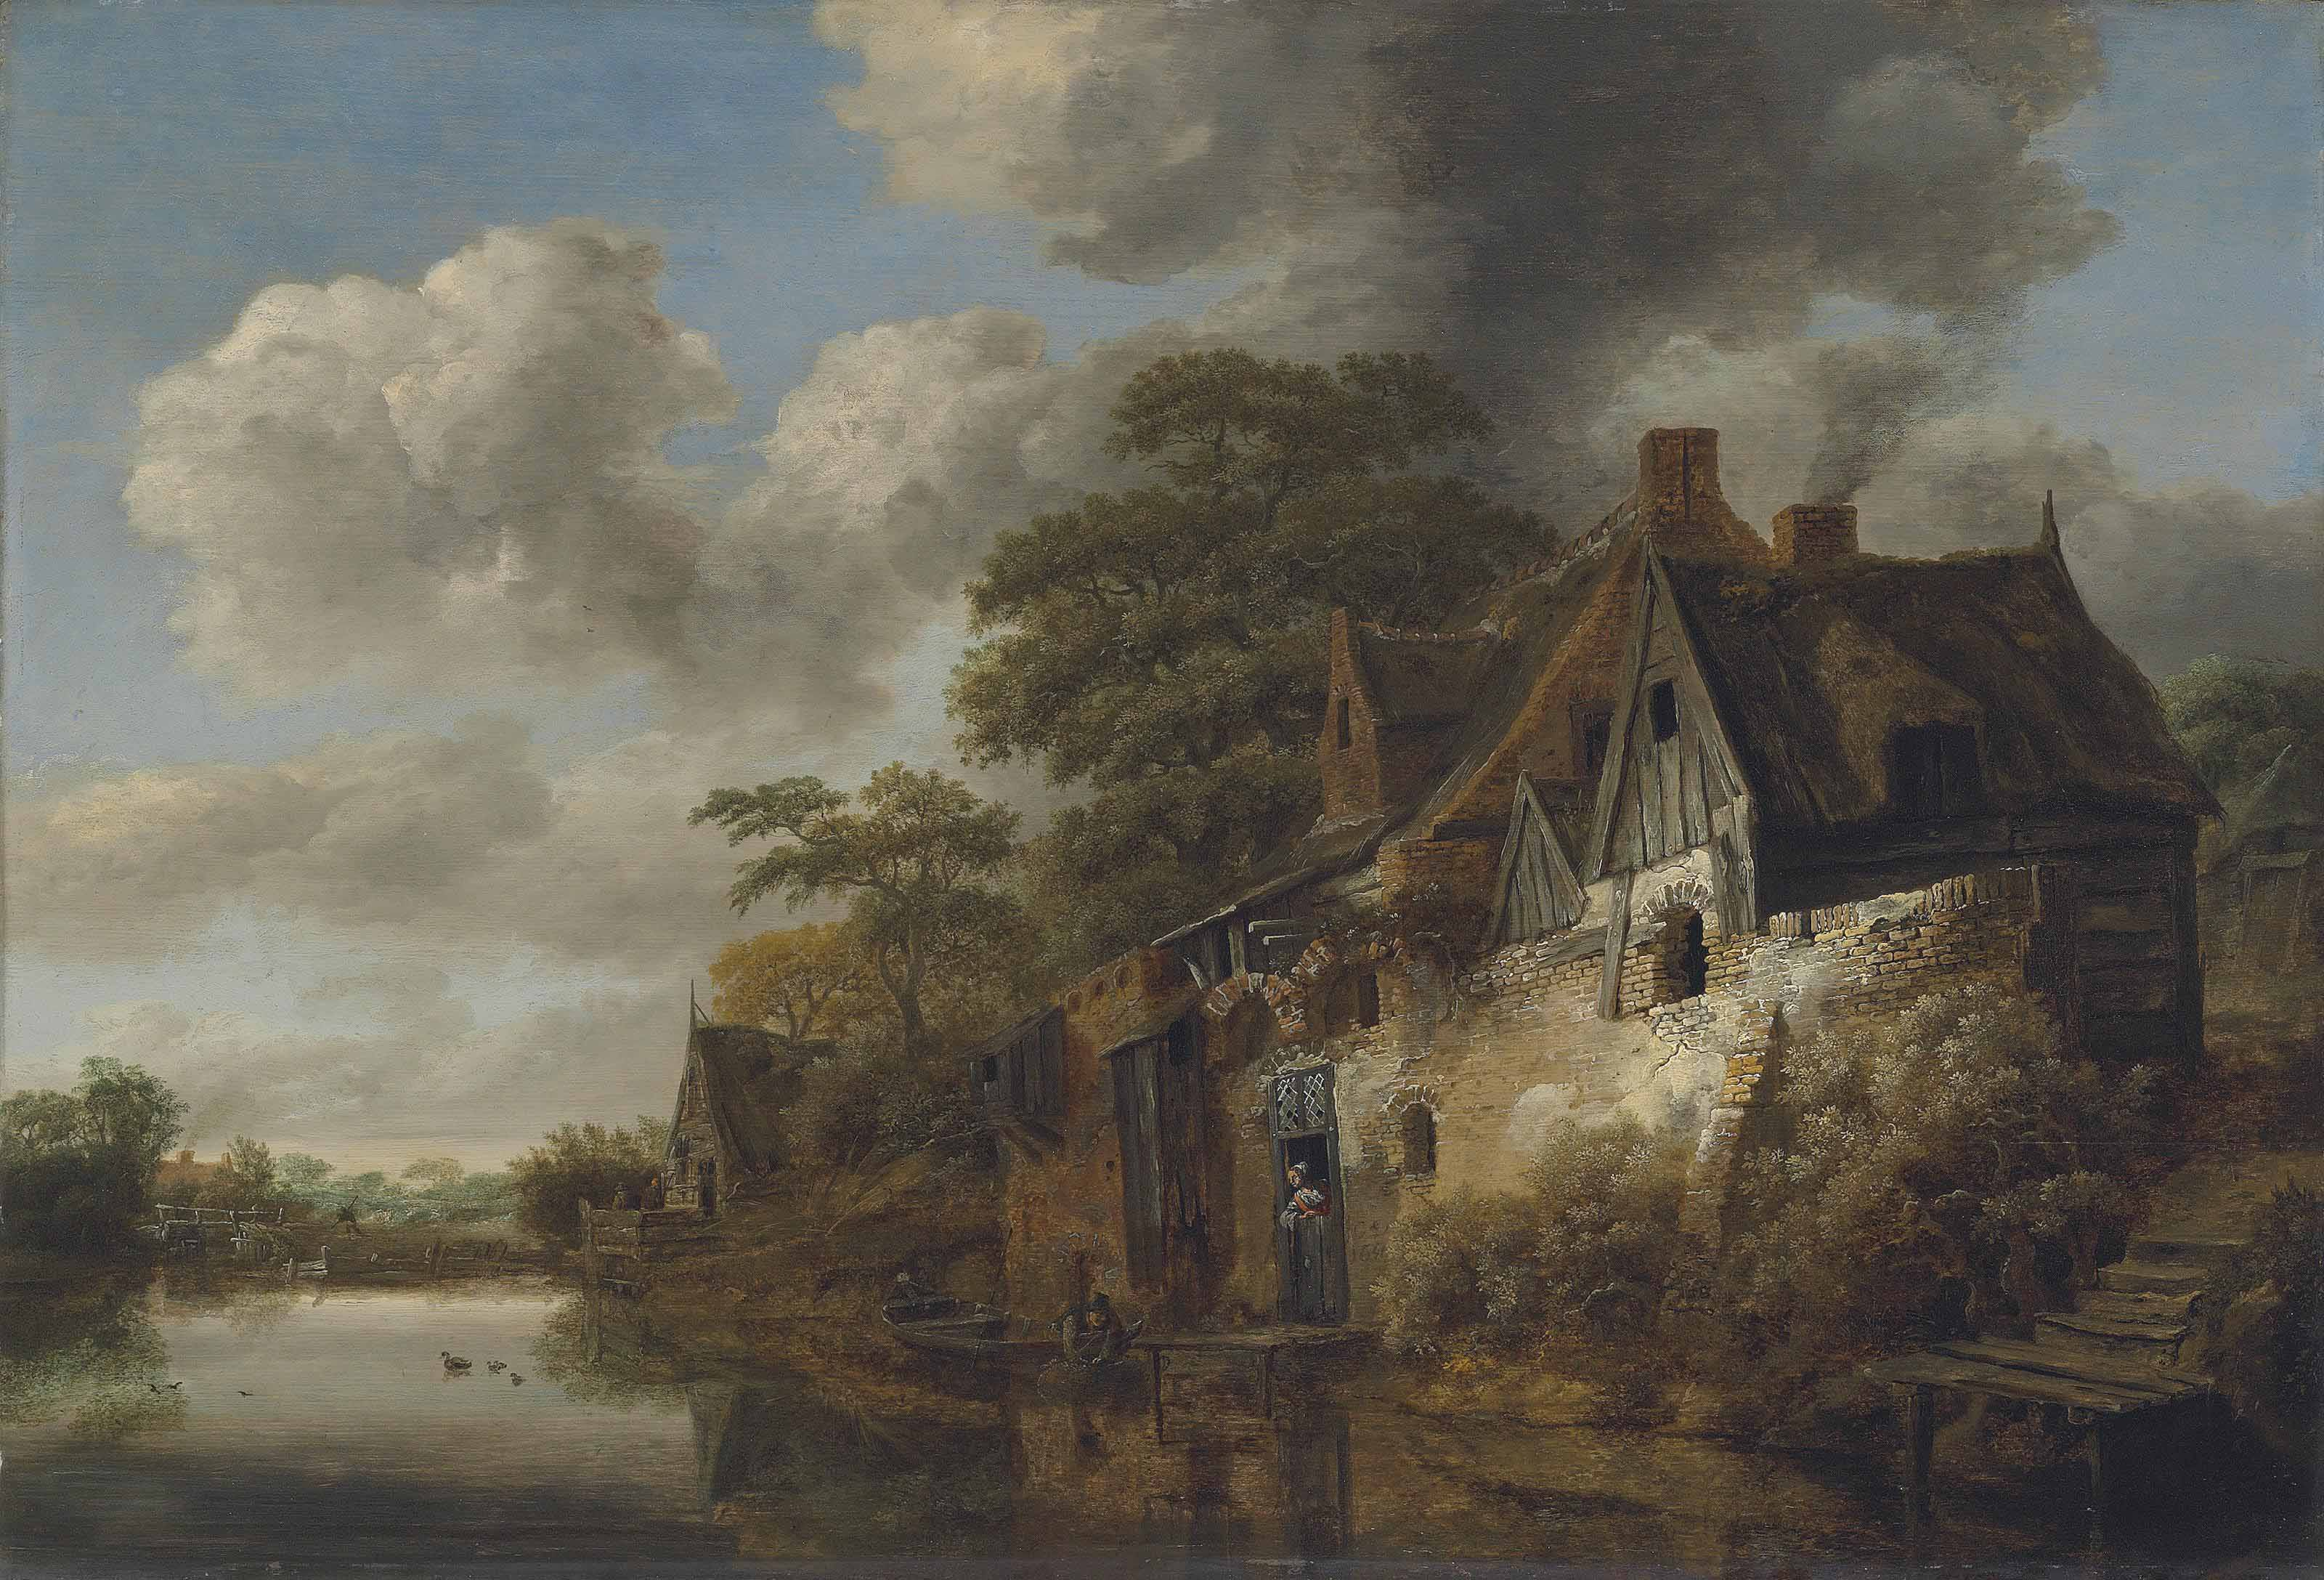 Cornelis Decker (? 1610/20-167